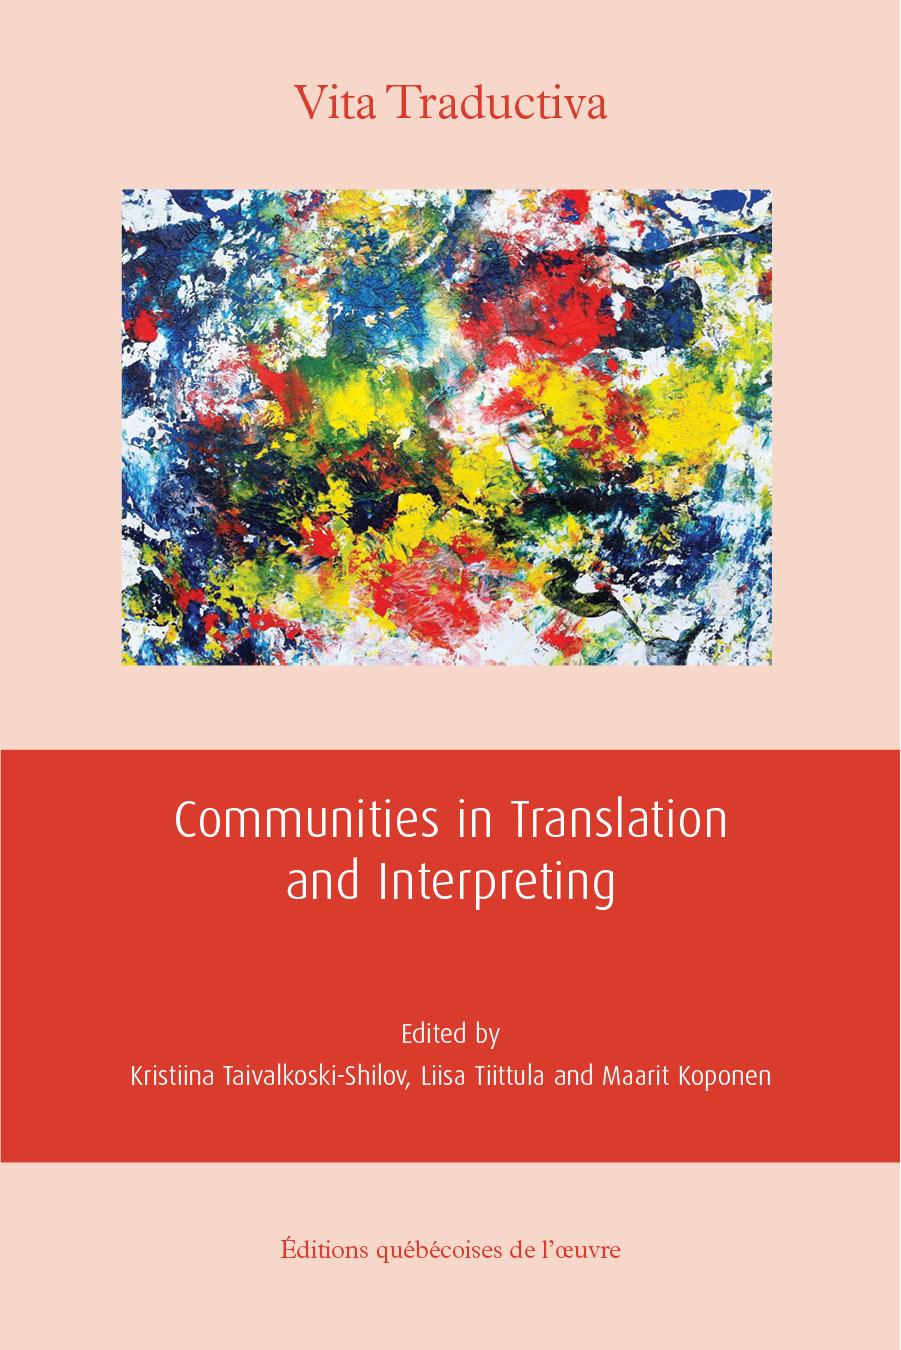 Communities in Translation and Interpreting